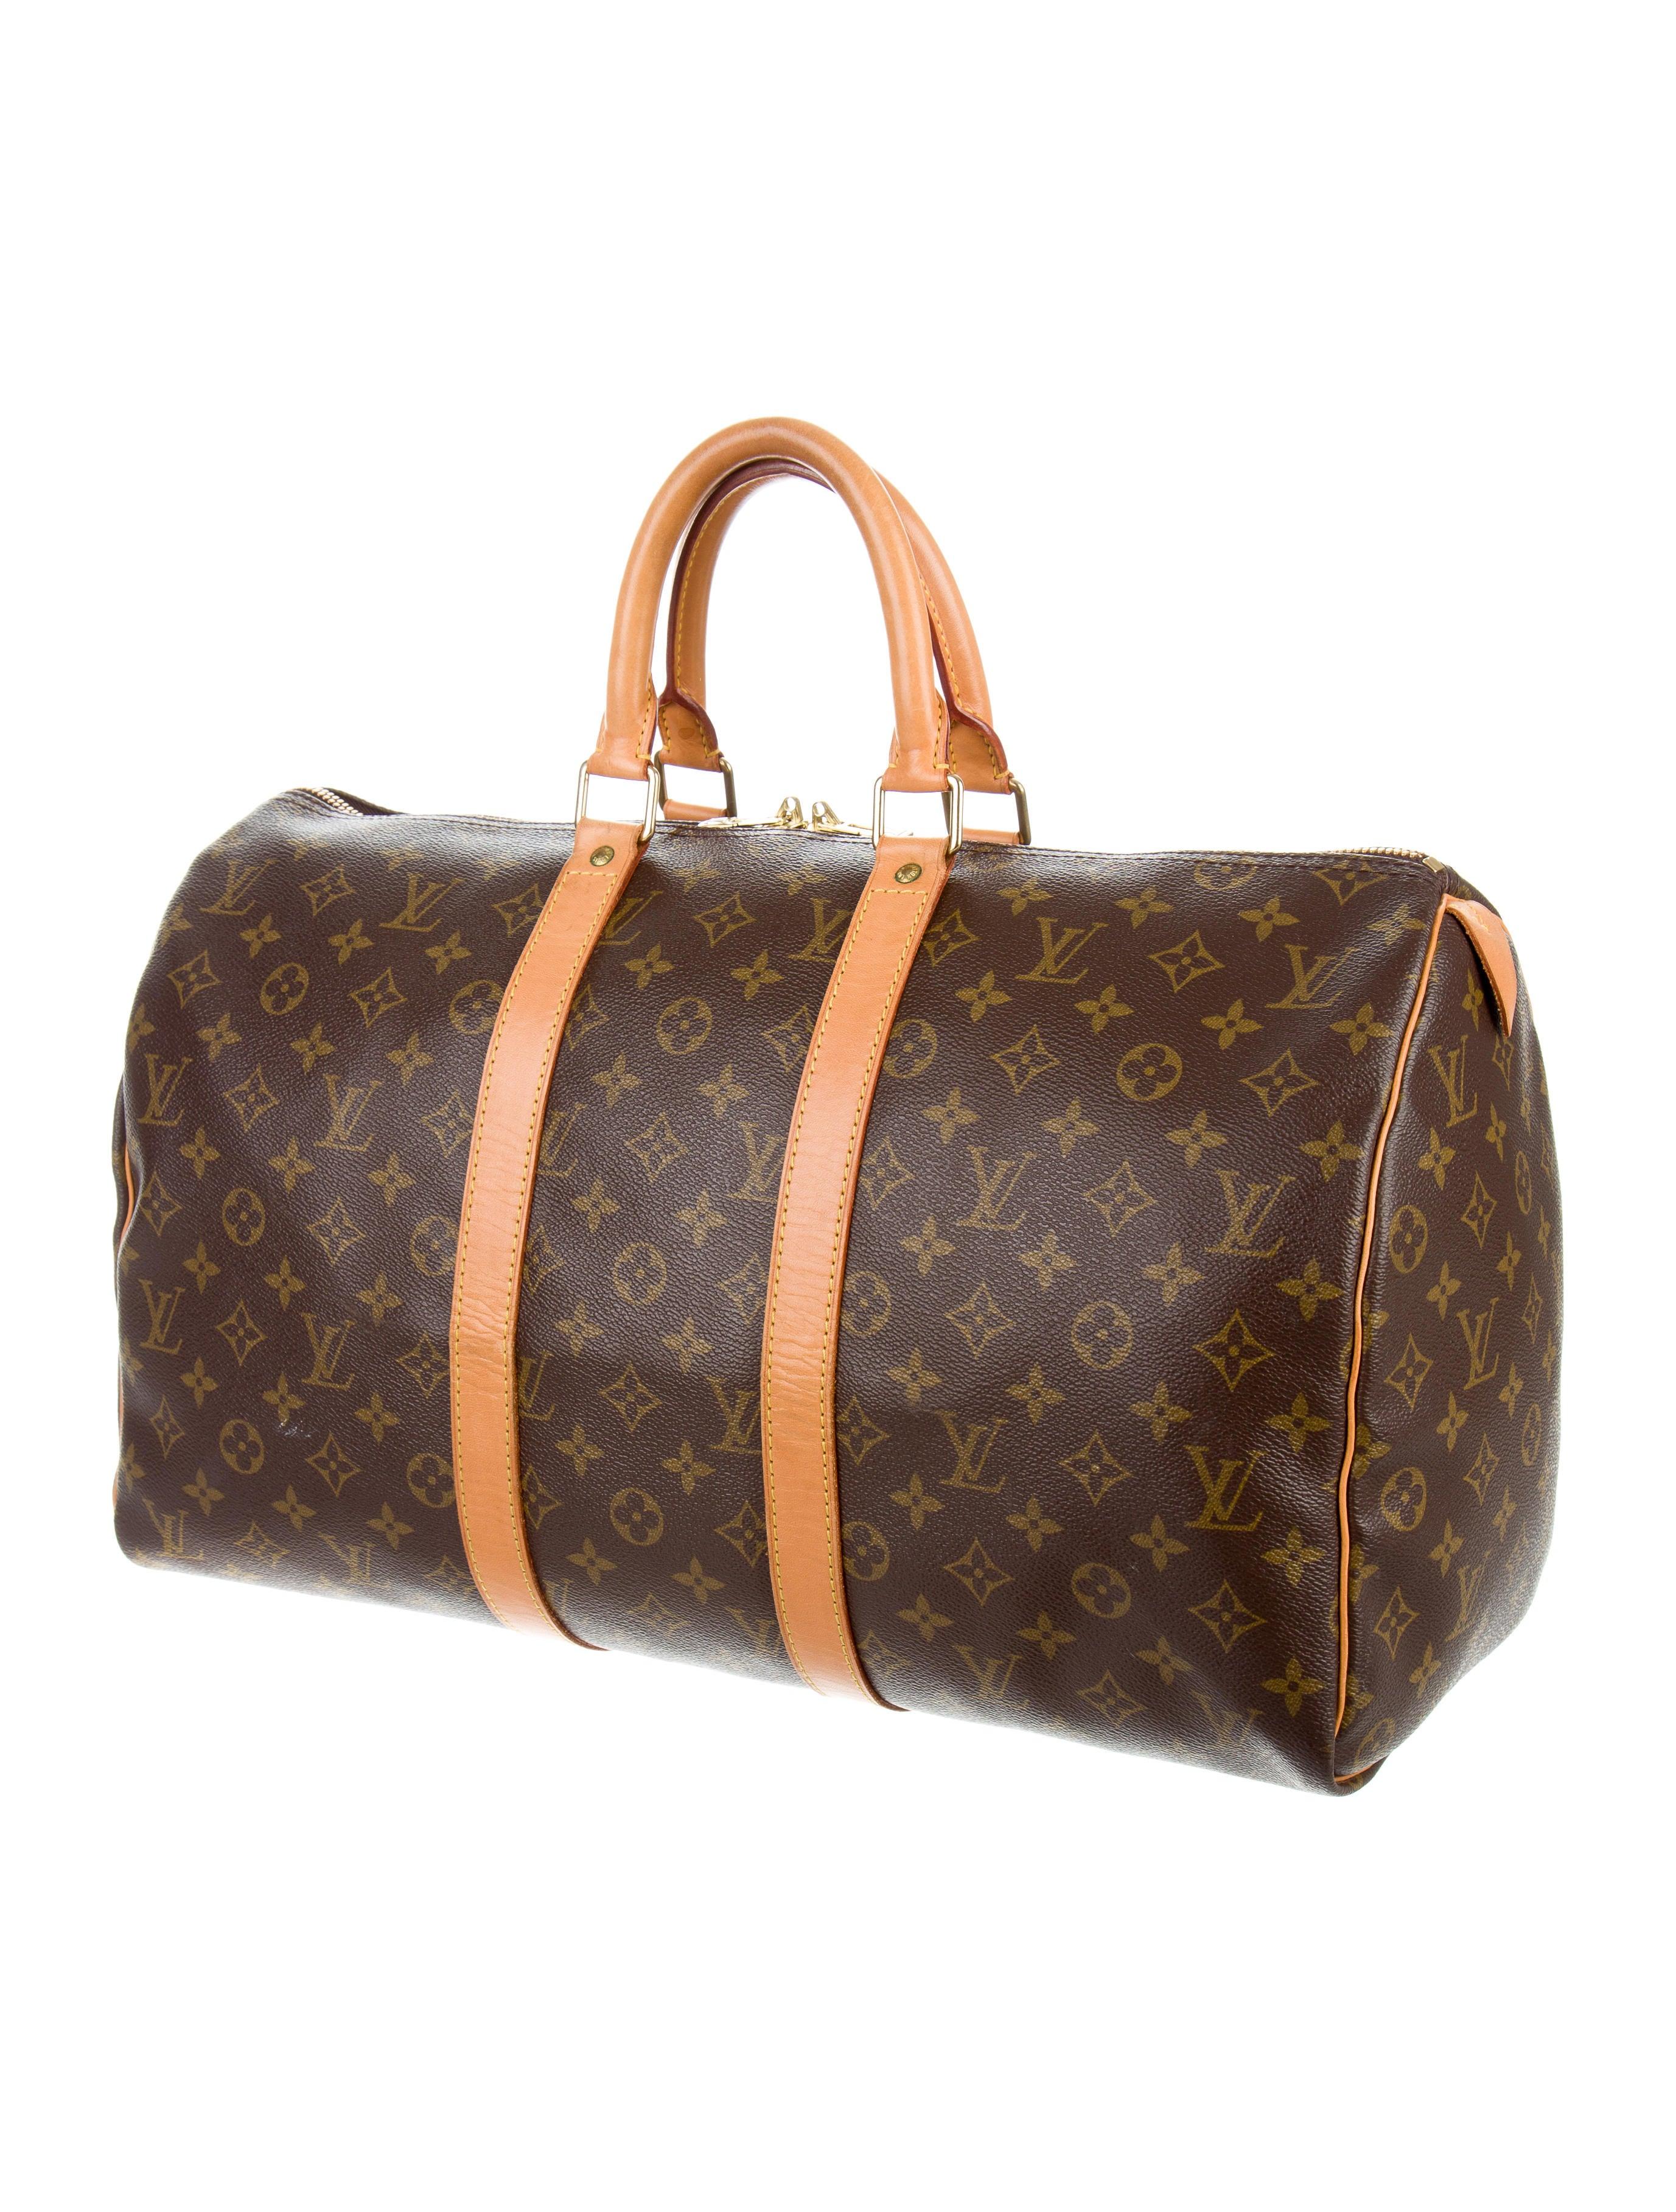 louis vuitton monogram keepall 45 handbags lou110899 the realreal. Black Bedroom Furniture Sets. Home Design Ideas